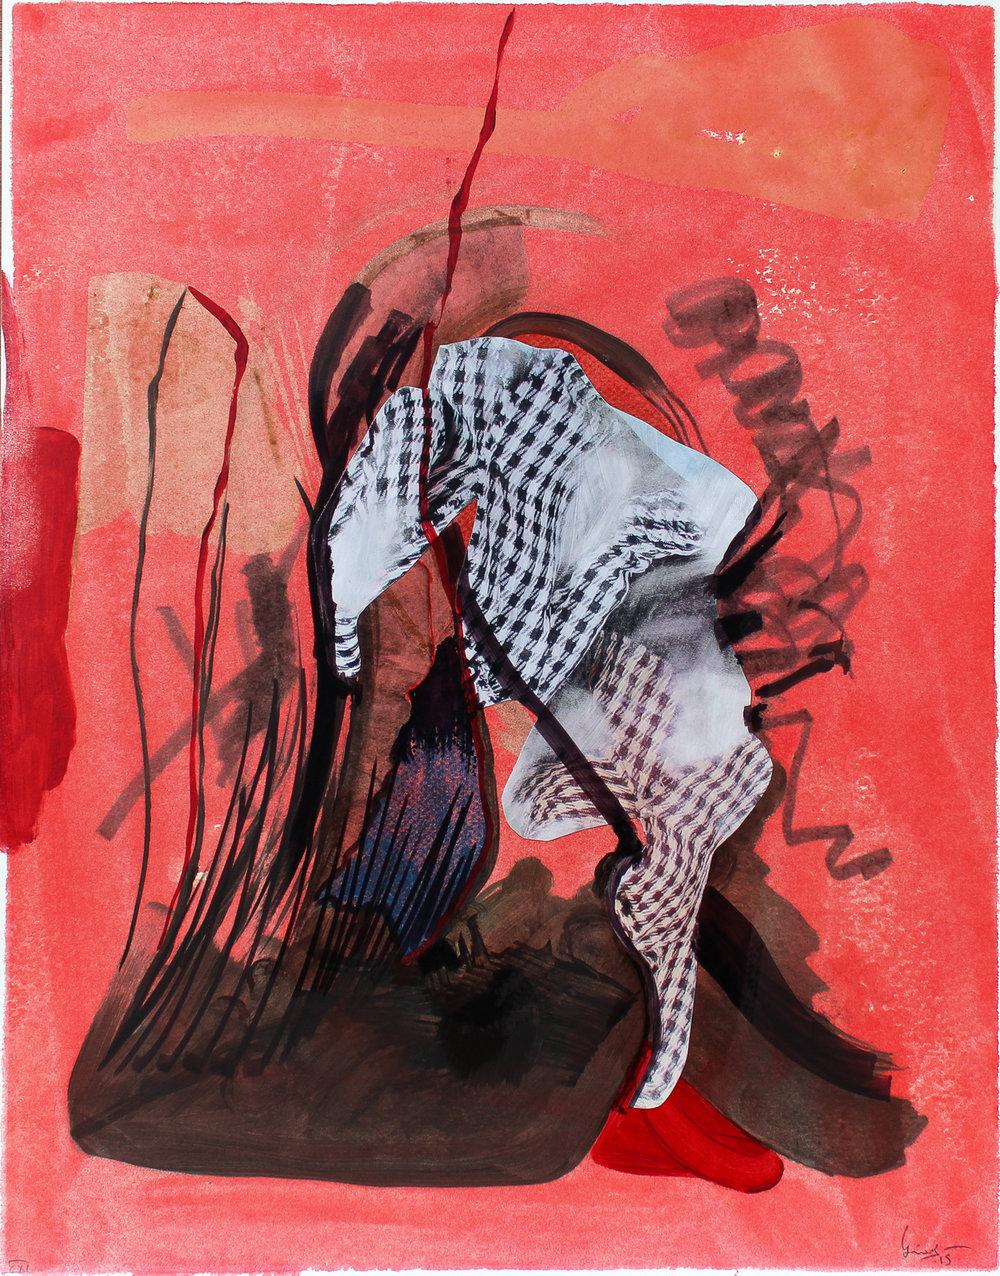 Untitled (detail) | Collage Series   |  ©  Lino Martinez